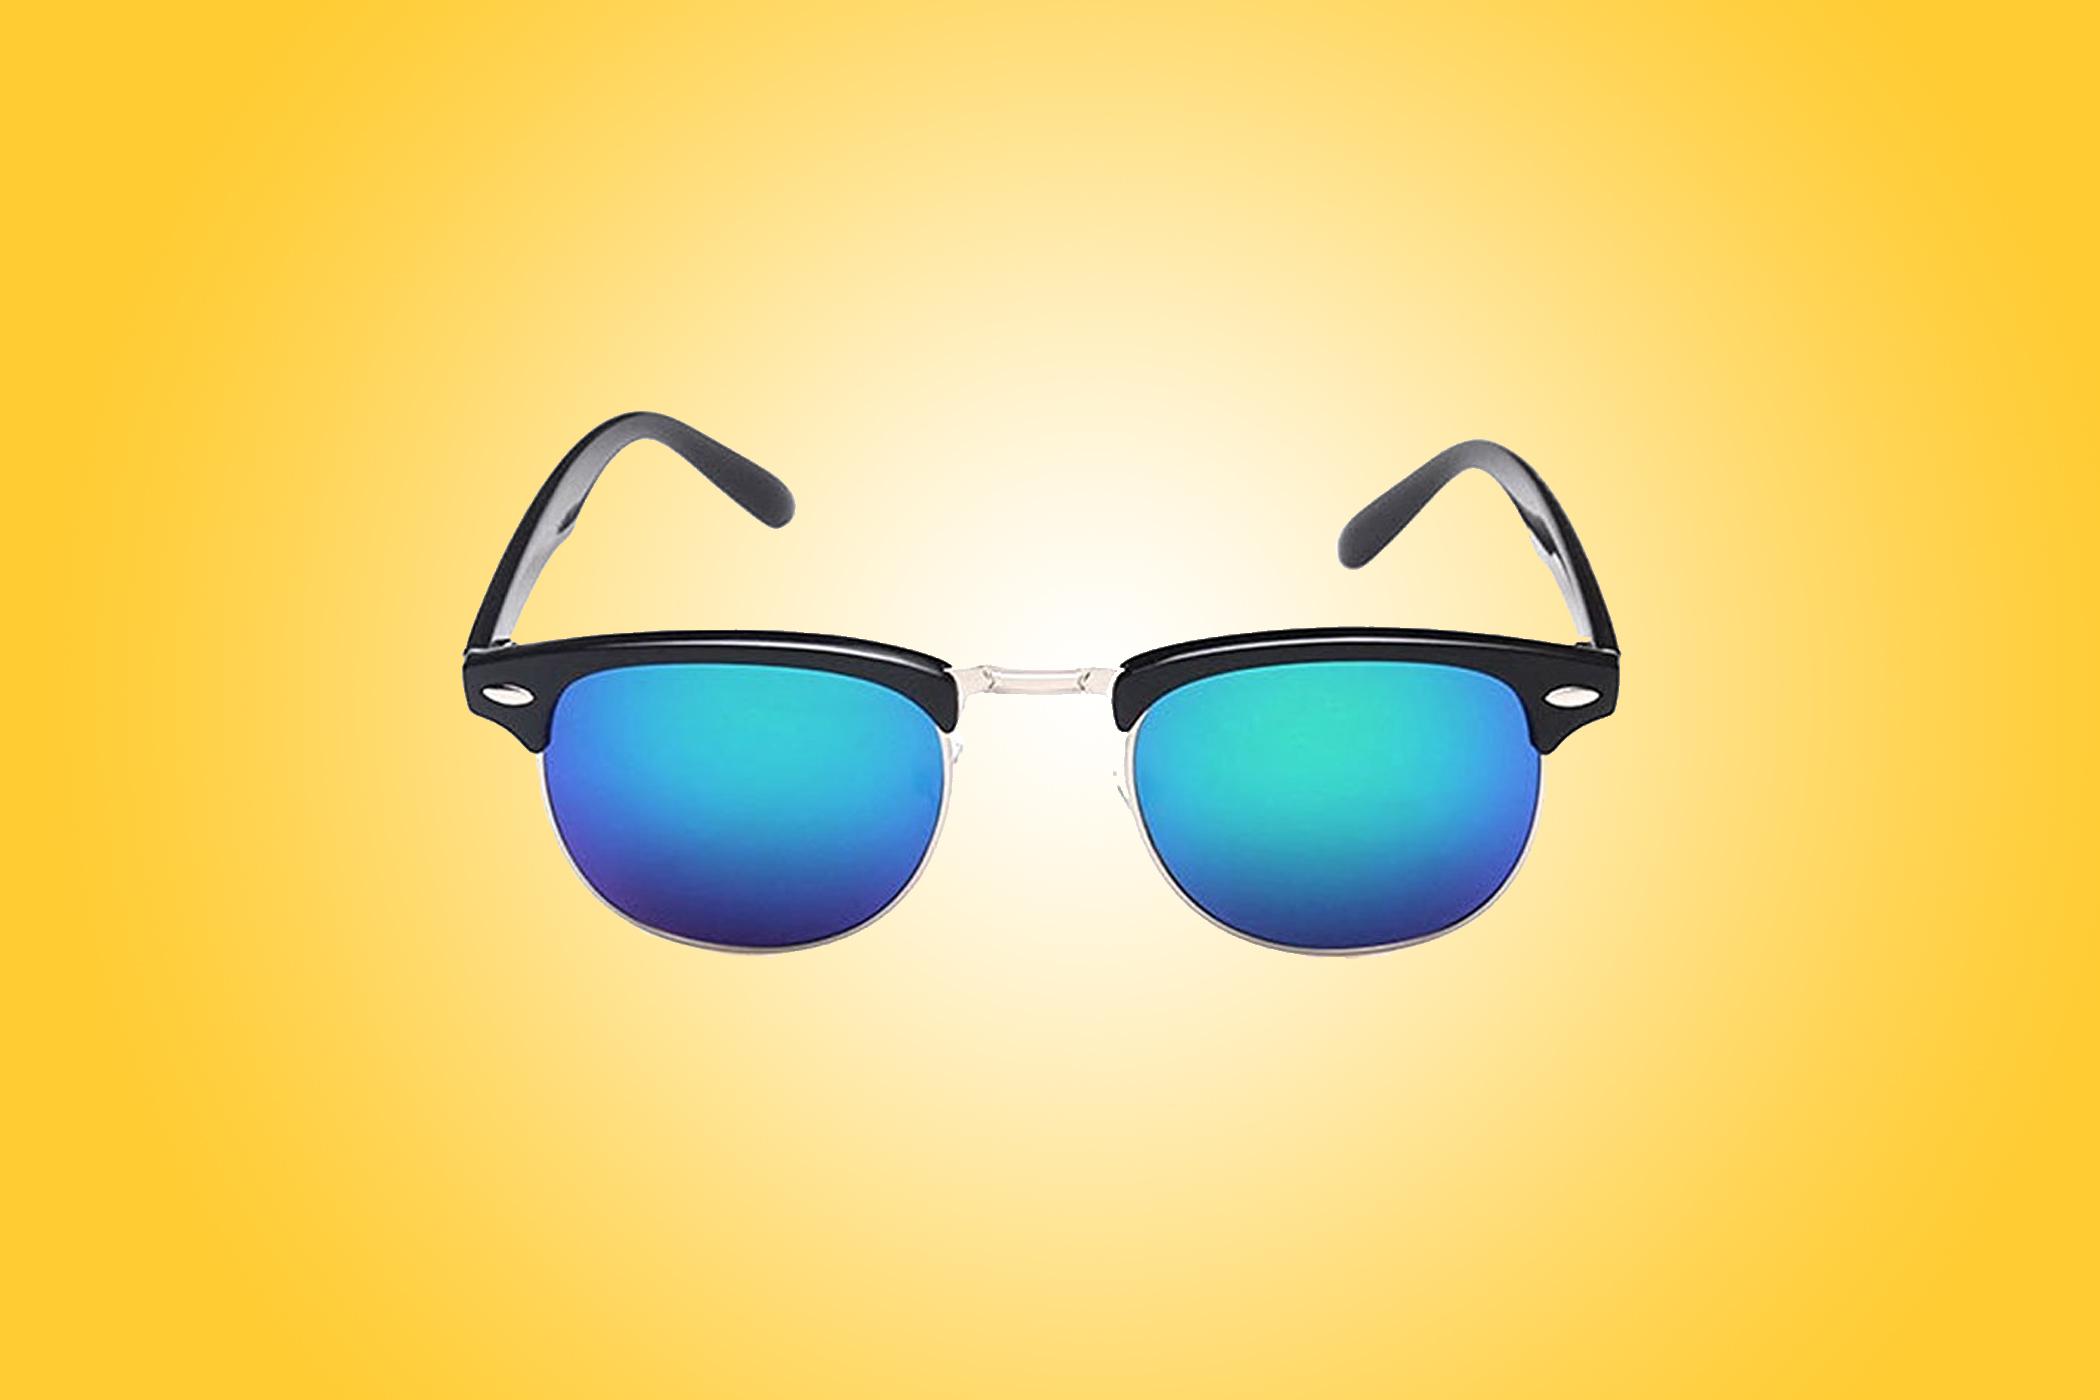 170316-amazon-sunglasses